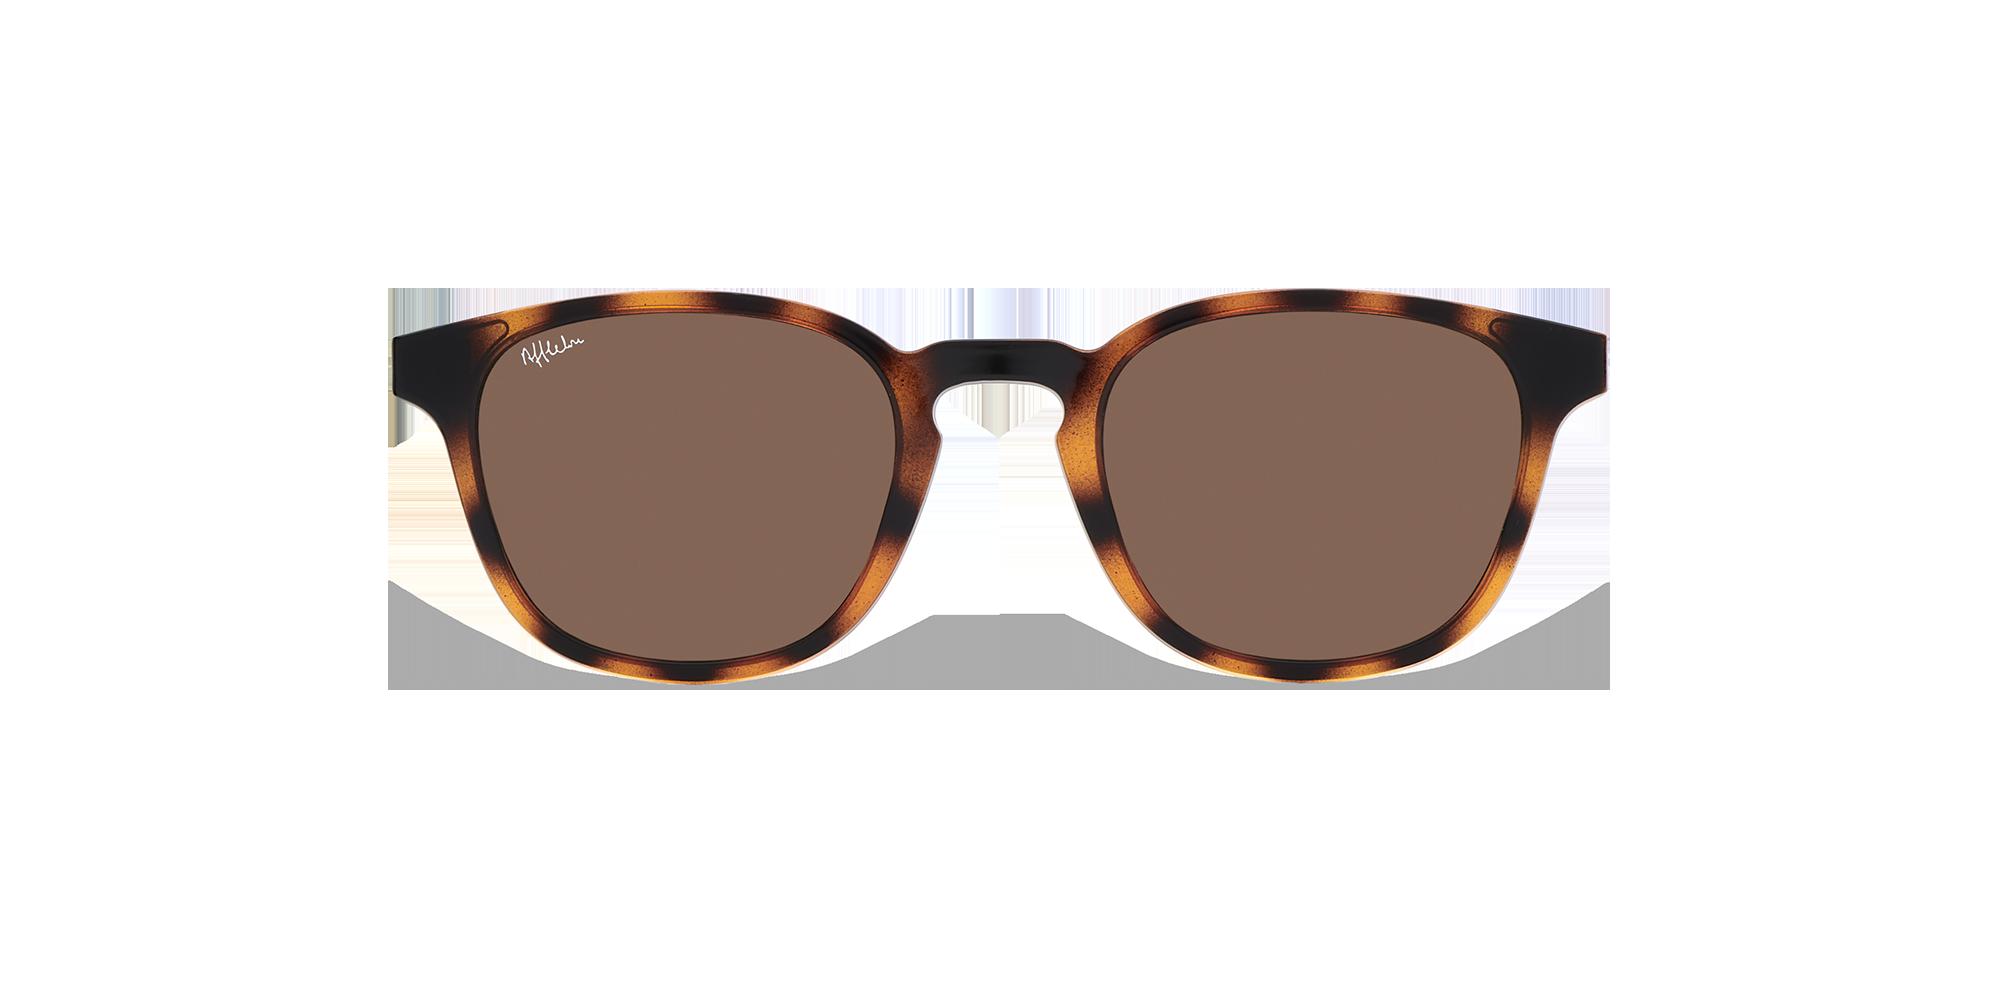 afflelou/france/products/smart_clip/clips_glasses/07630036429150_face.png